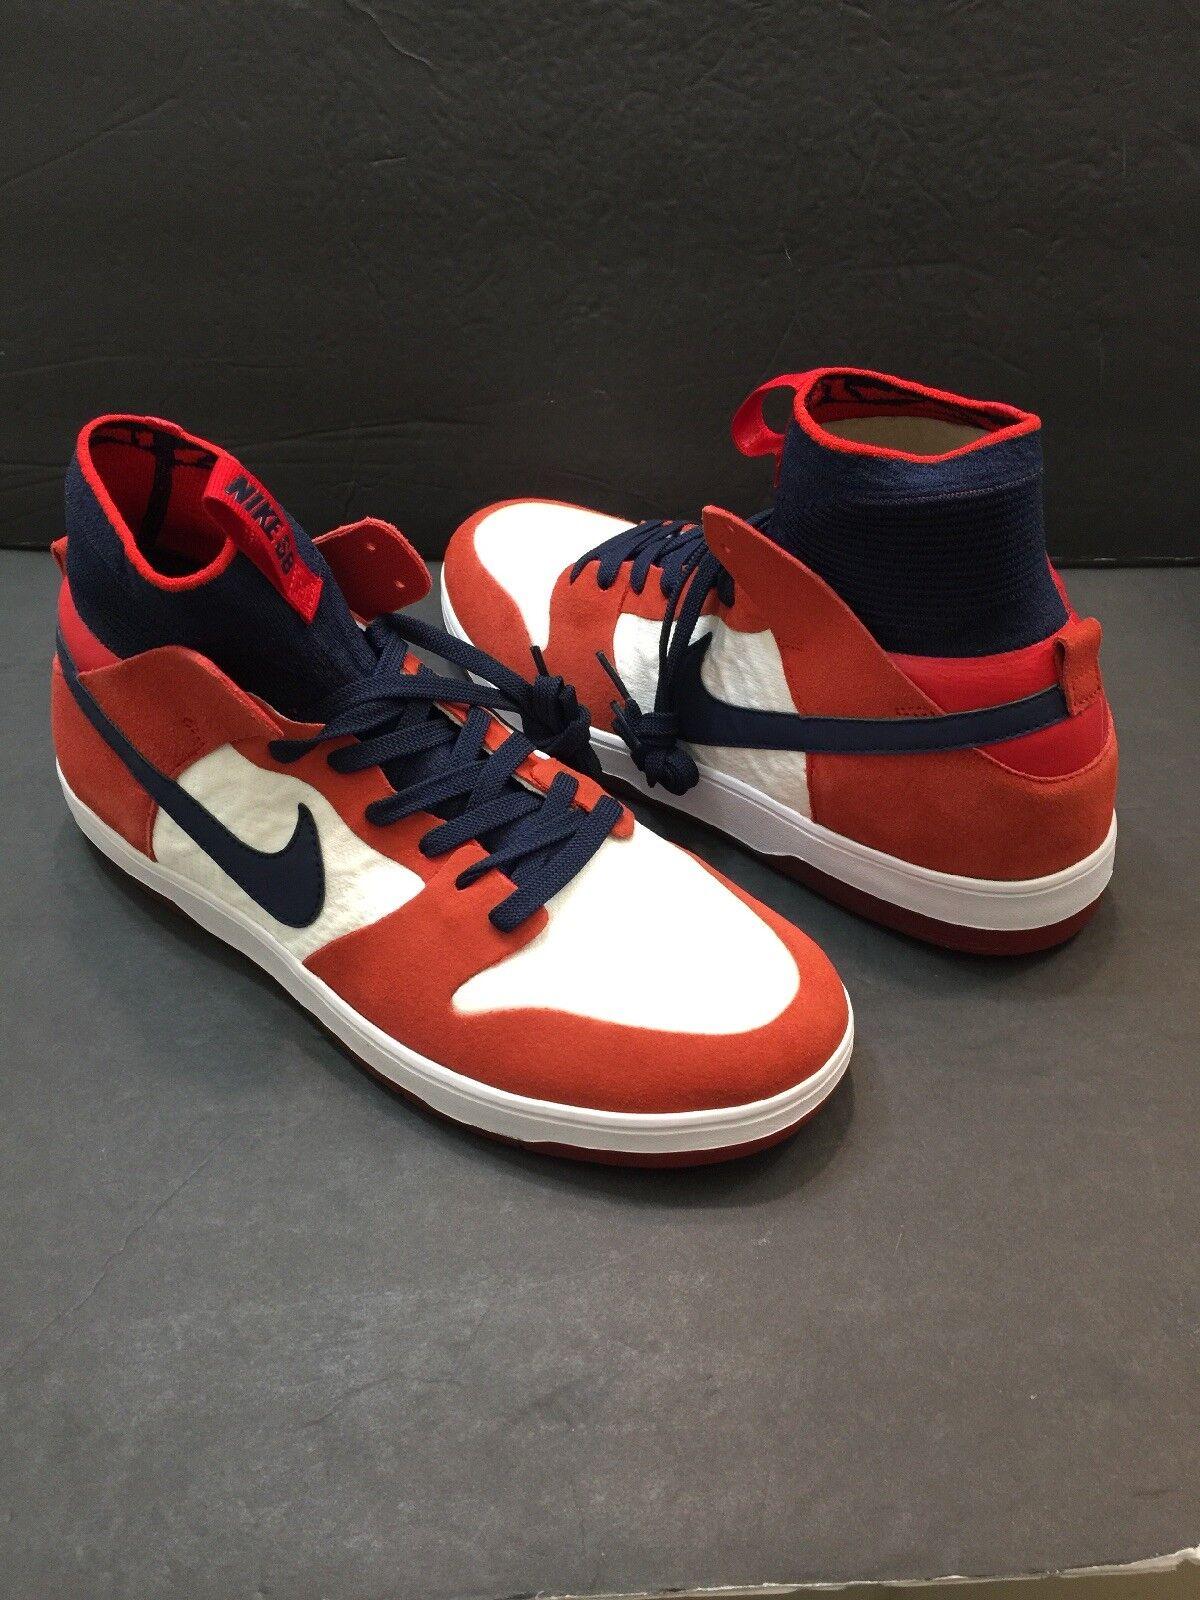 Nike biancastro sb zoom canestro alto elite - biancastro Nike air jordan sz 11 ea6591